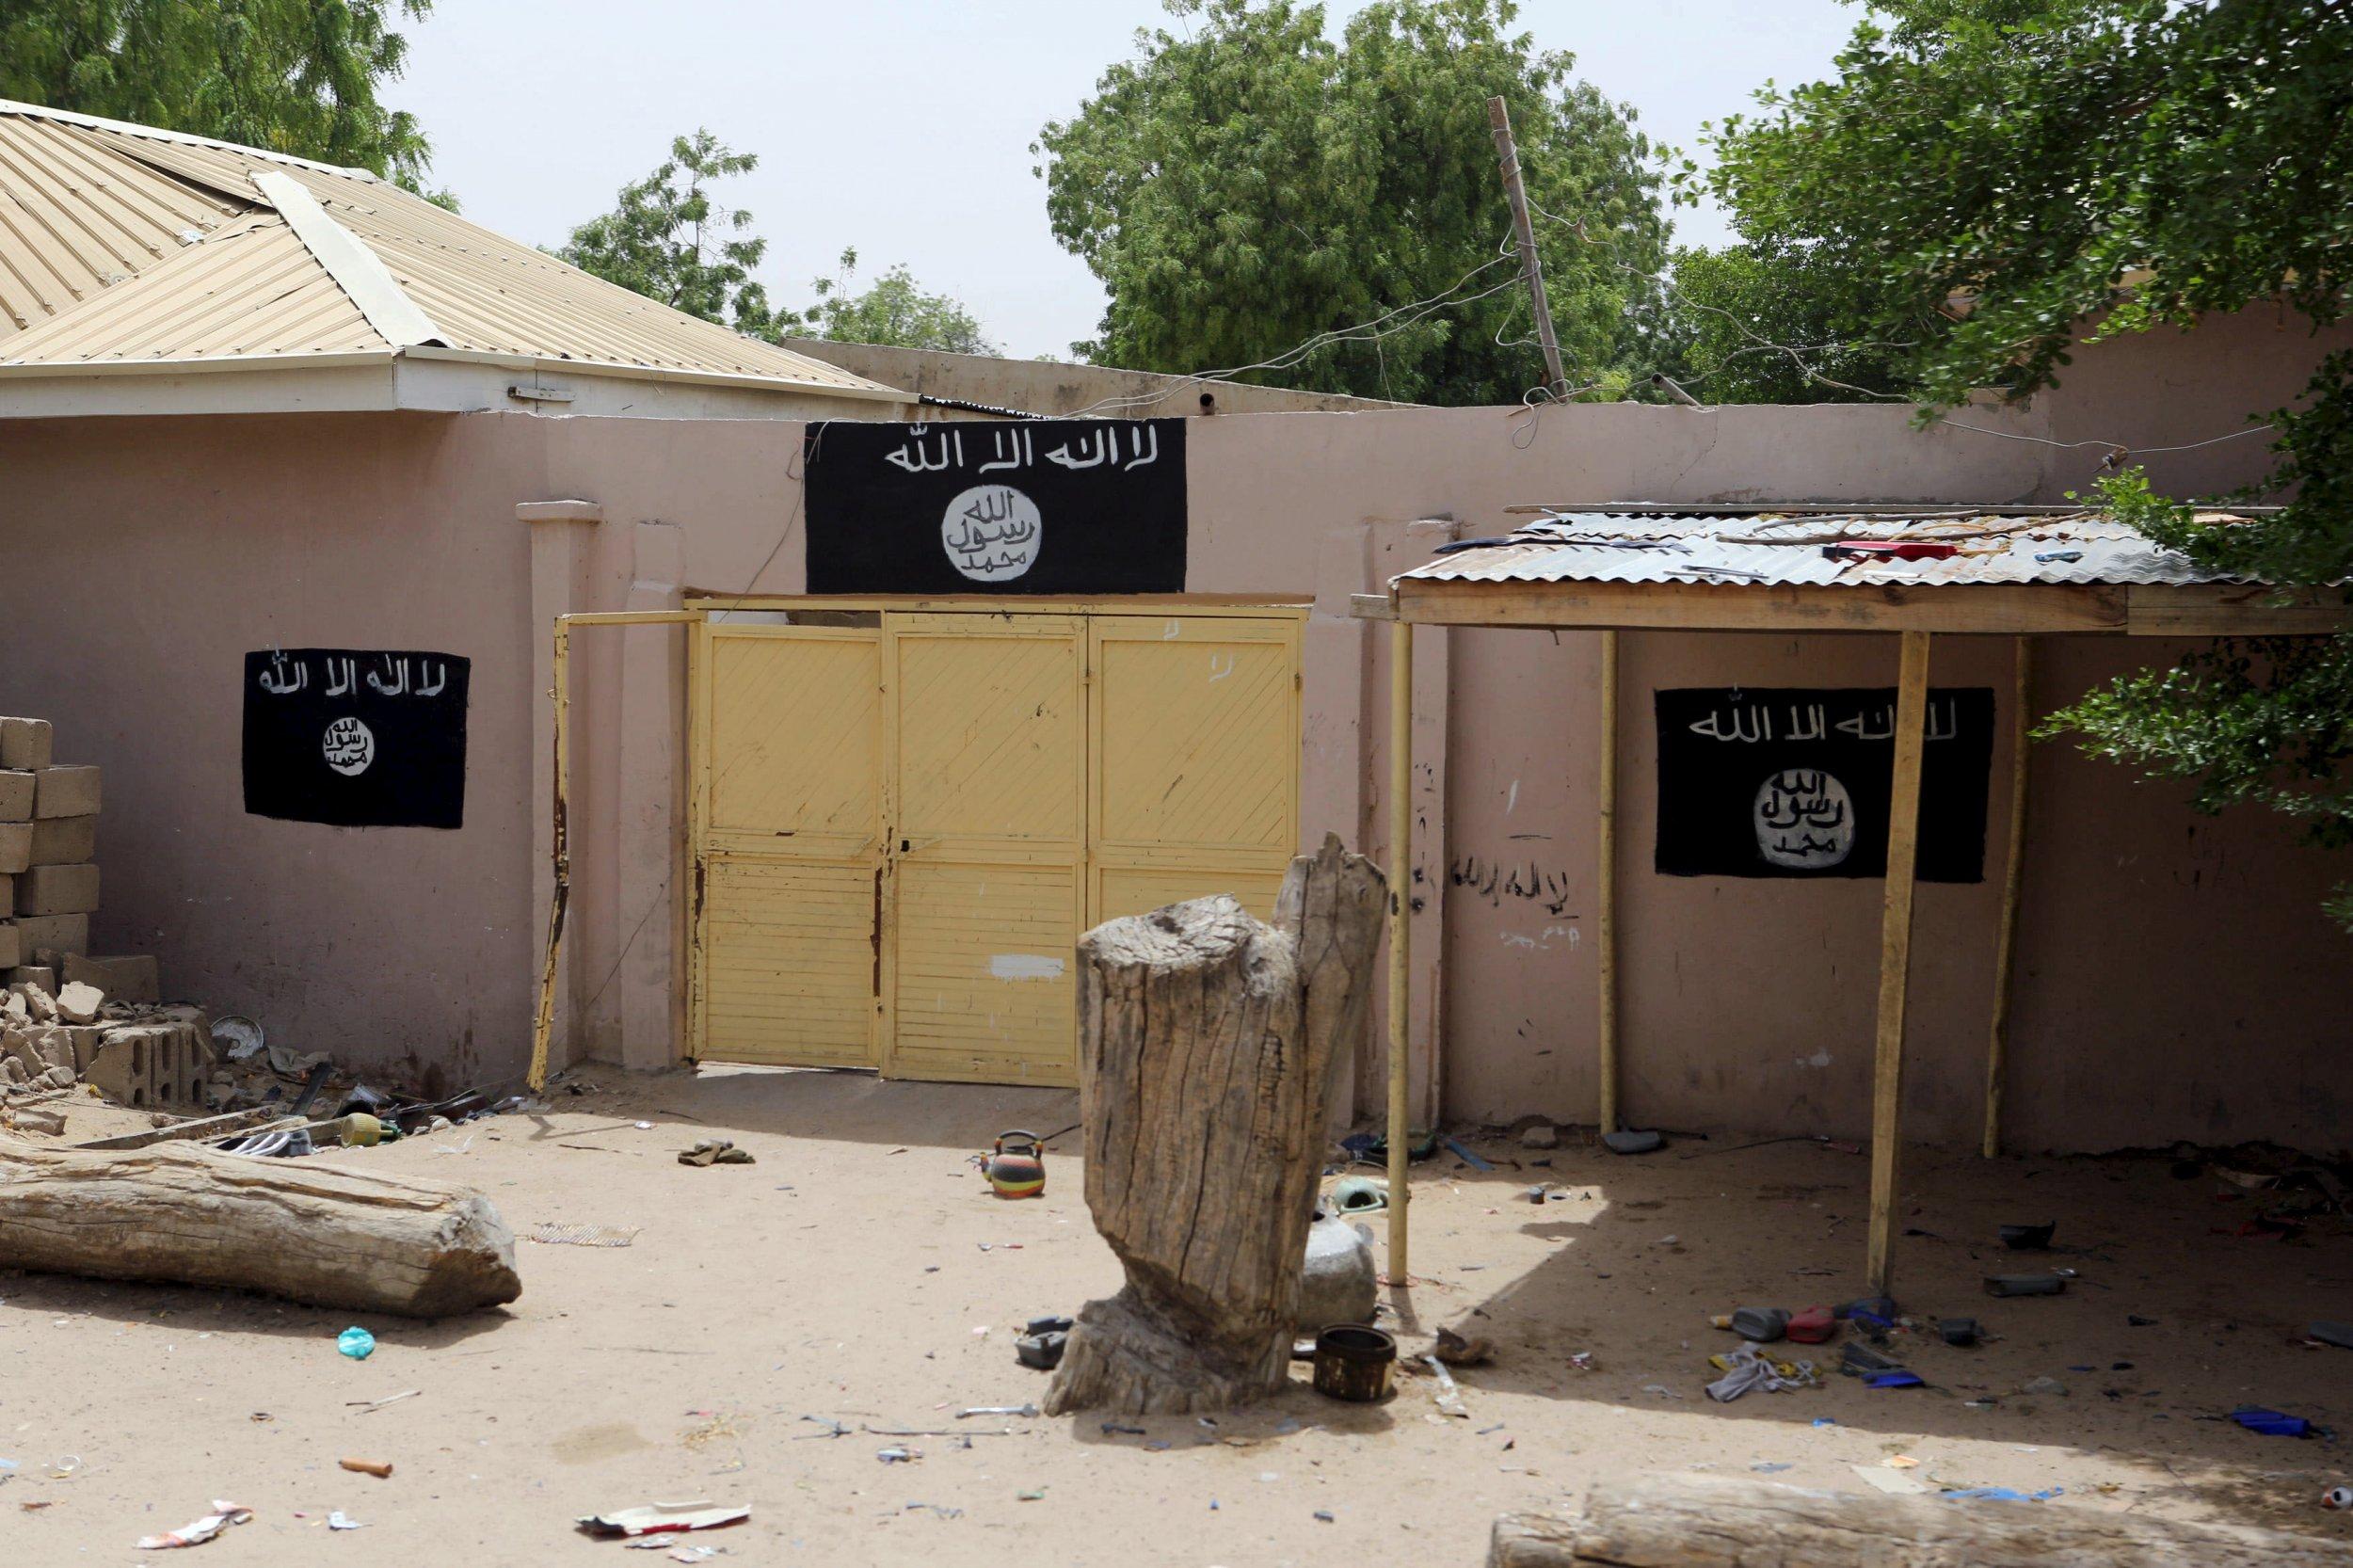 A Boko Haram painted wall in Damasak, Nigeria.